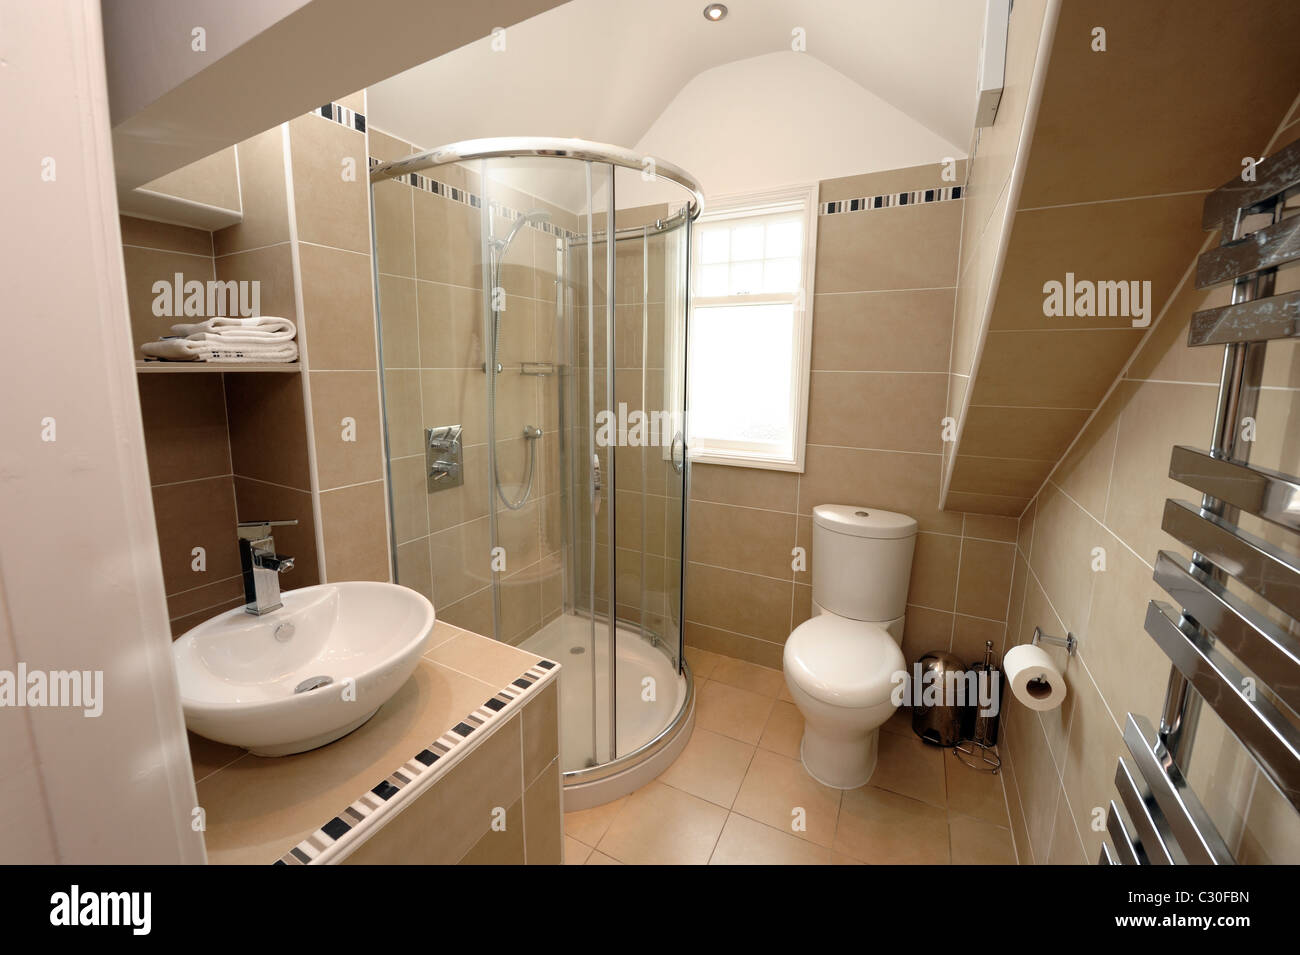 Modern loft conversion shower room stock photo royalty - Deco chambre loft ...